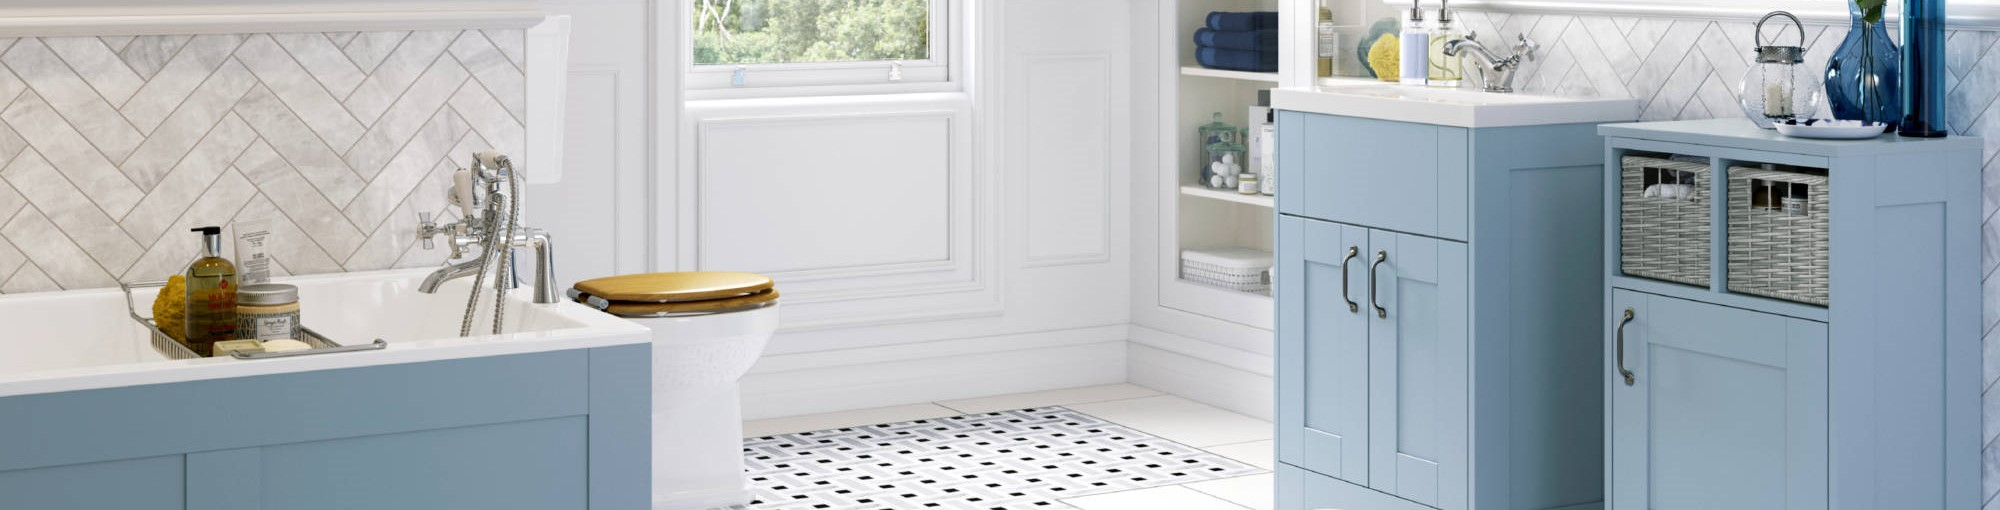 Online Home Improvements Bathrooms